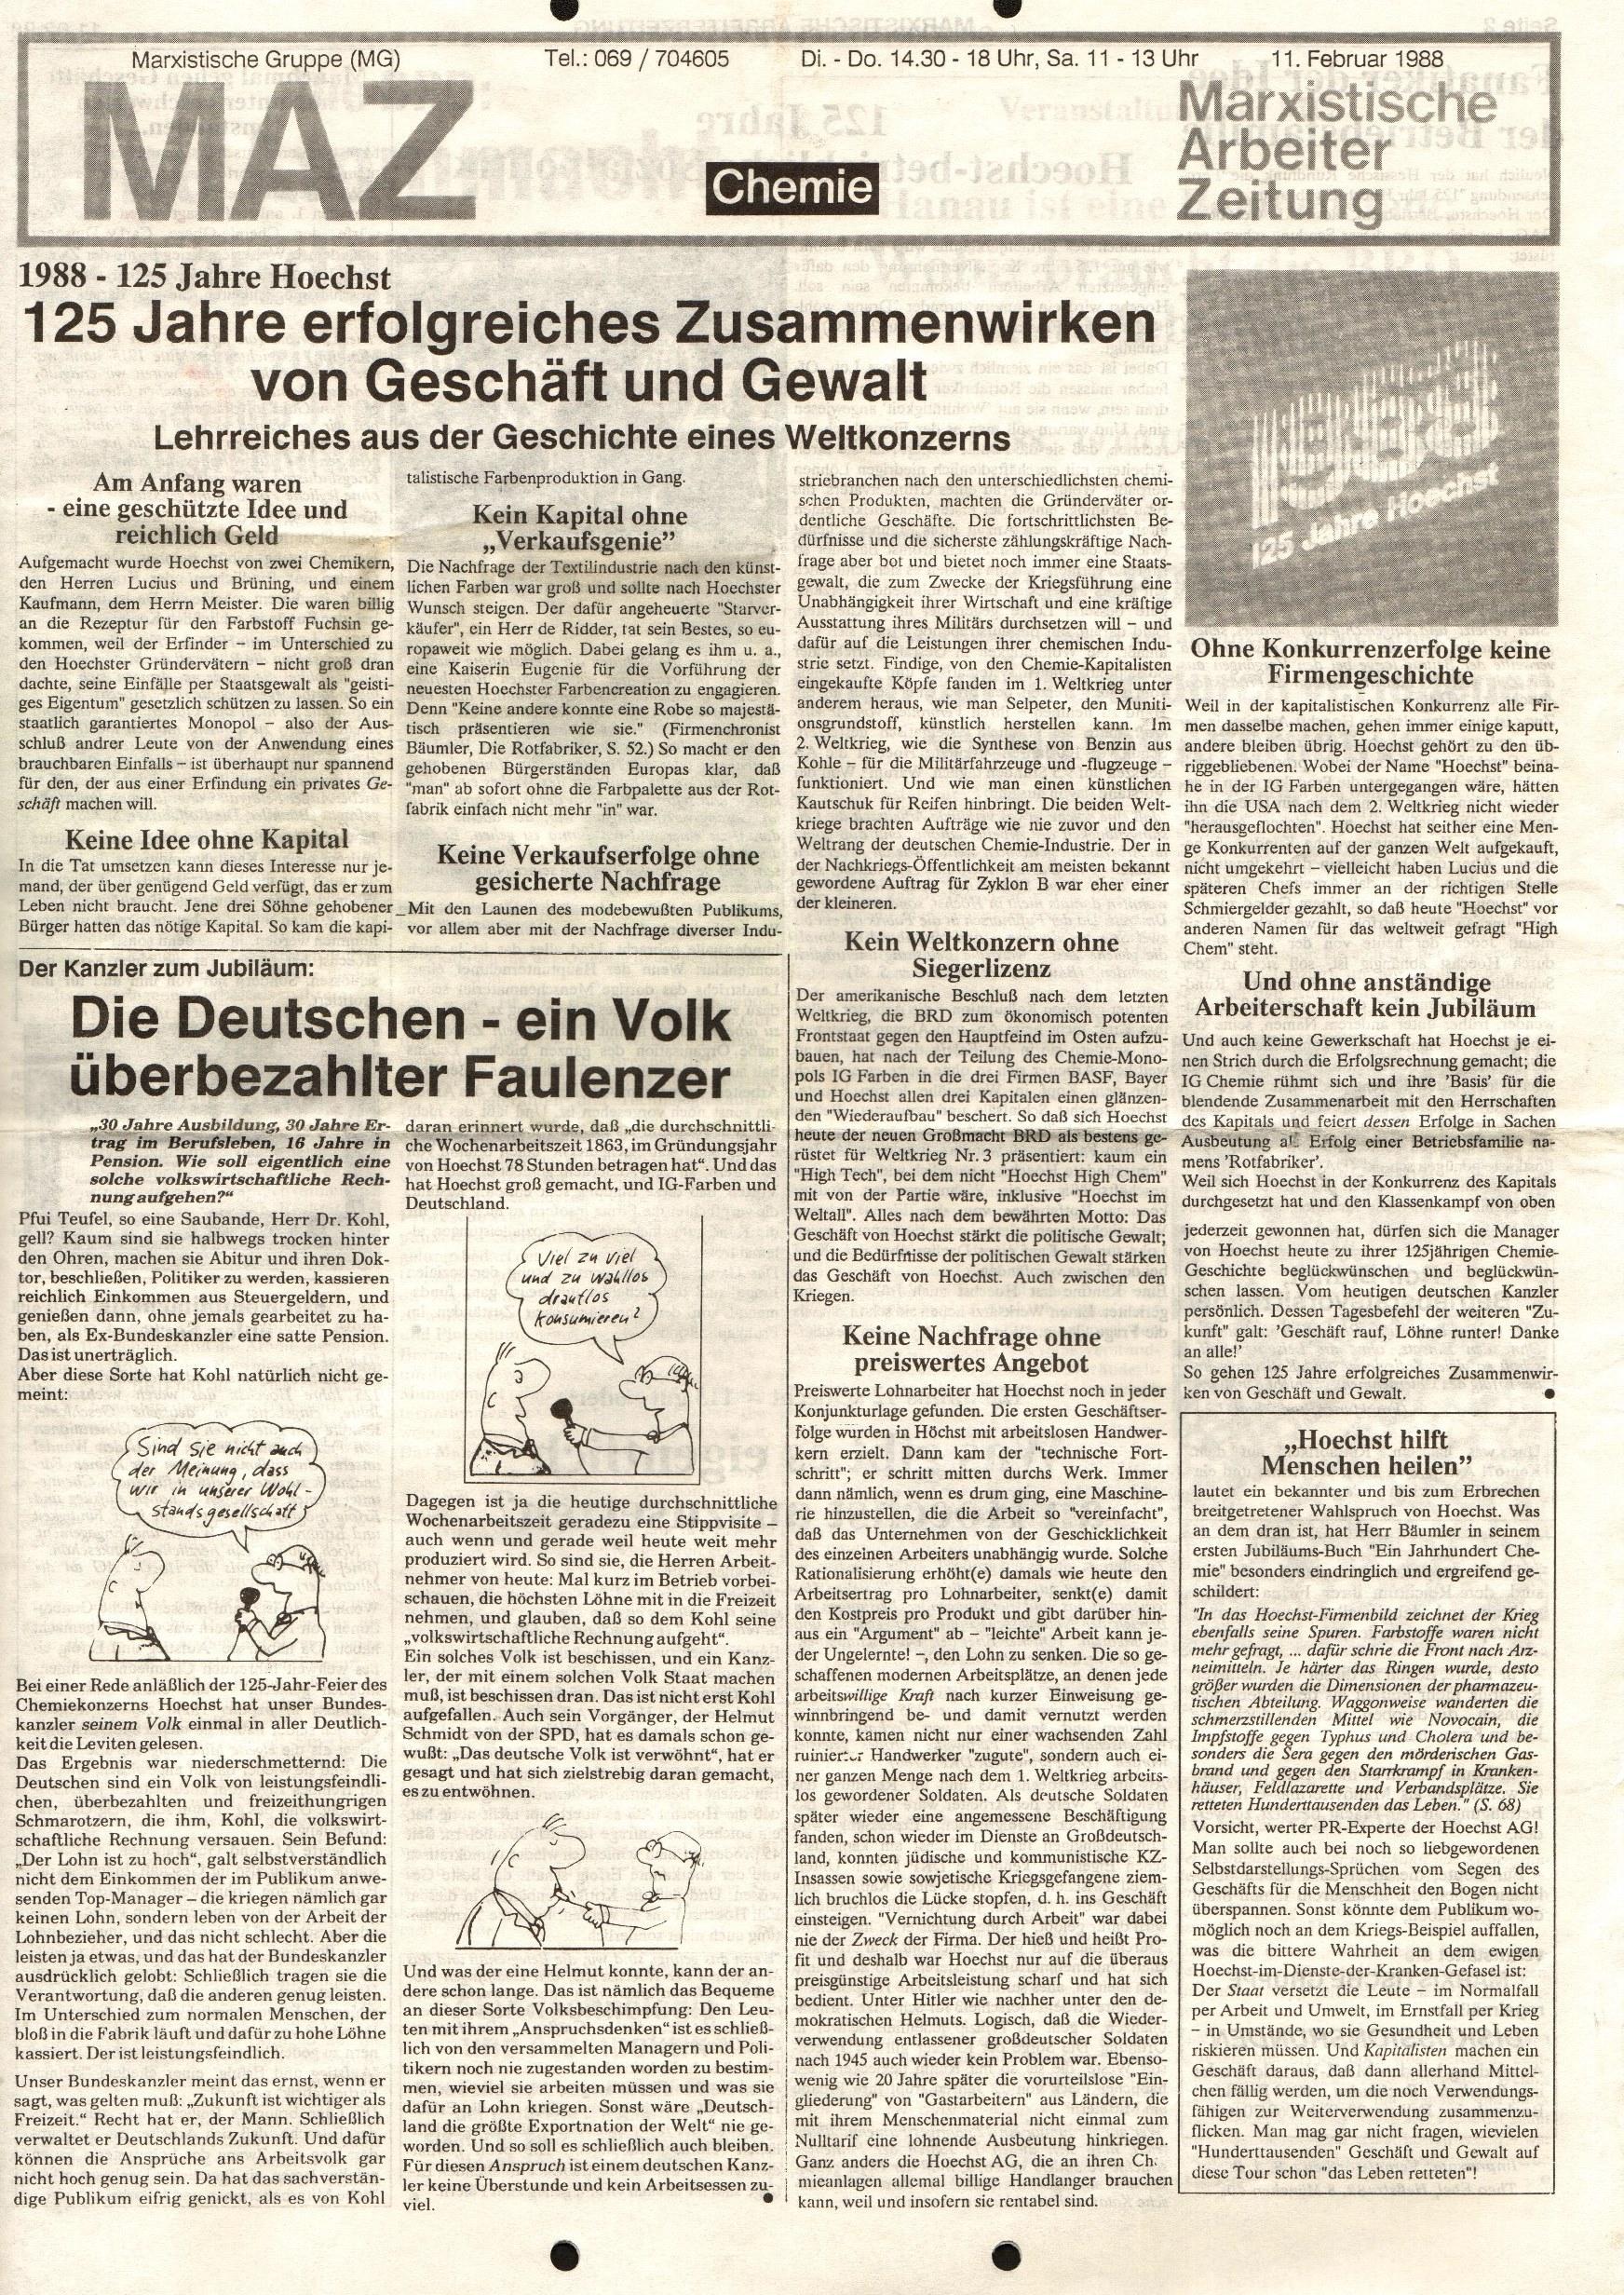 Frankfurt_CPK_Hoechst_MAZ485